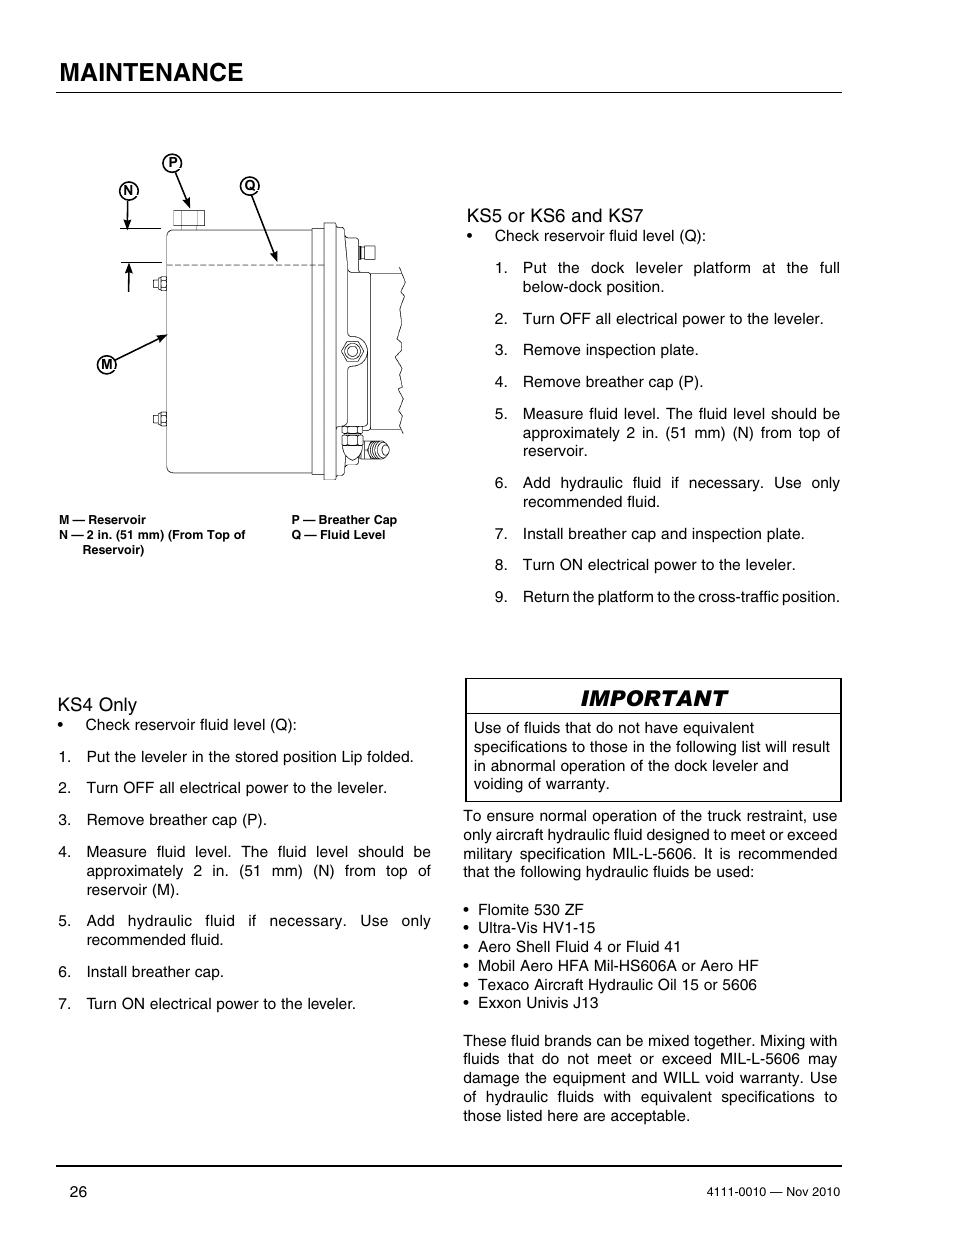 Maintenance, Important | Poweramp POWERHOOK SERIES User